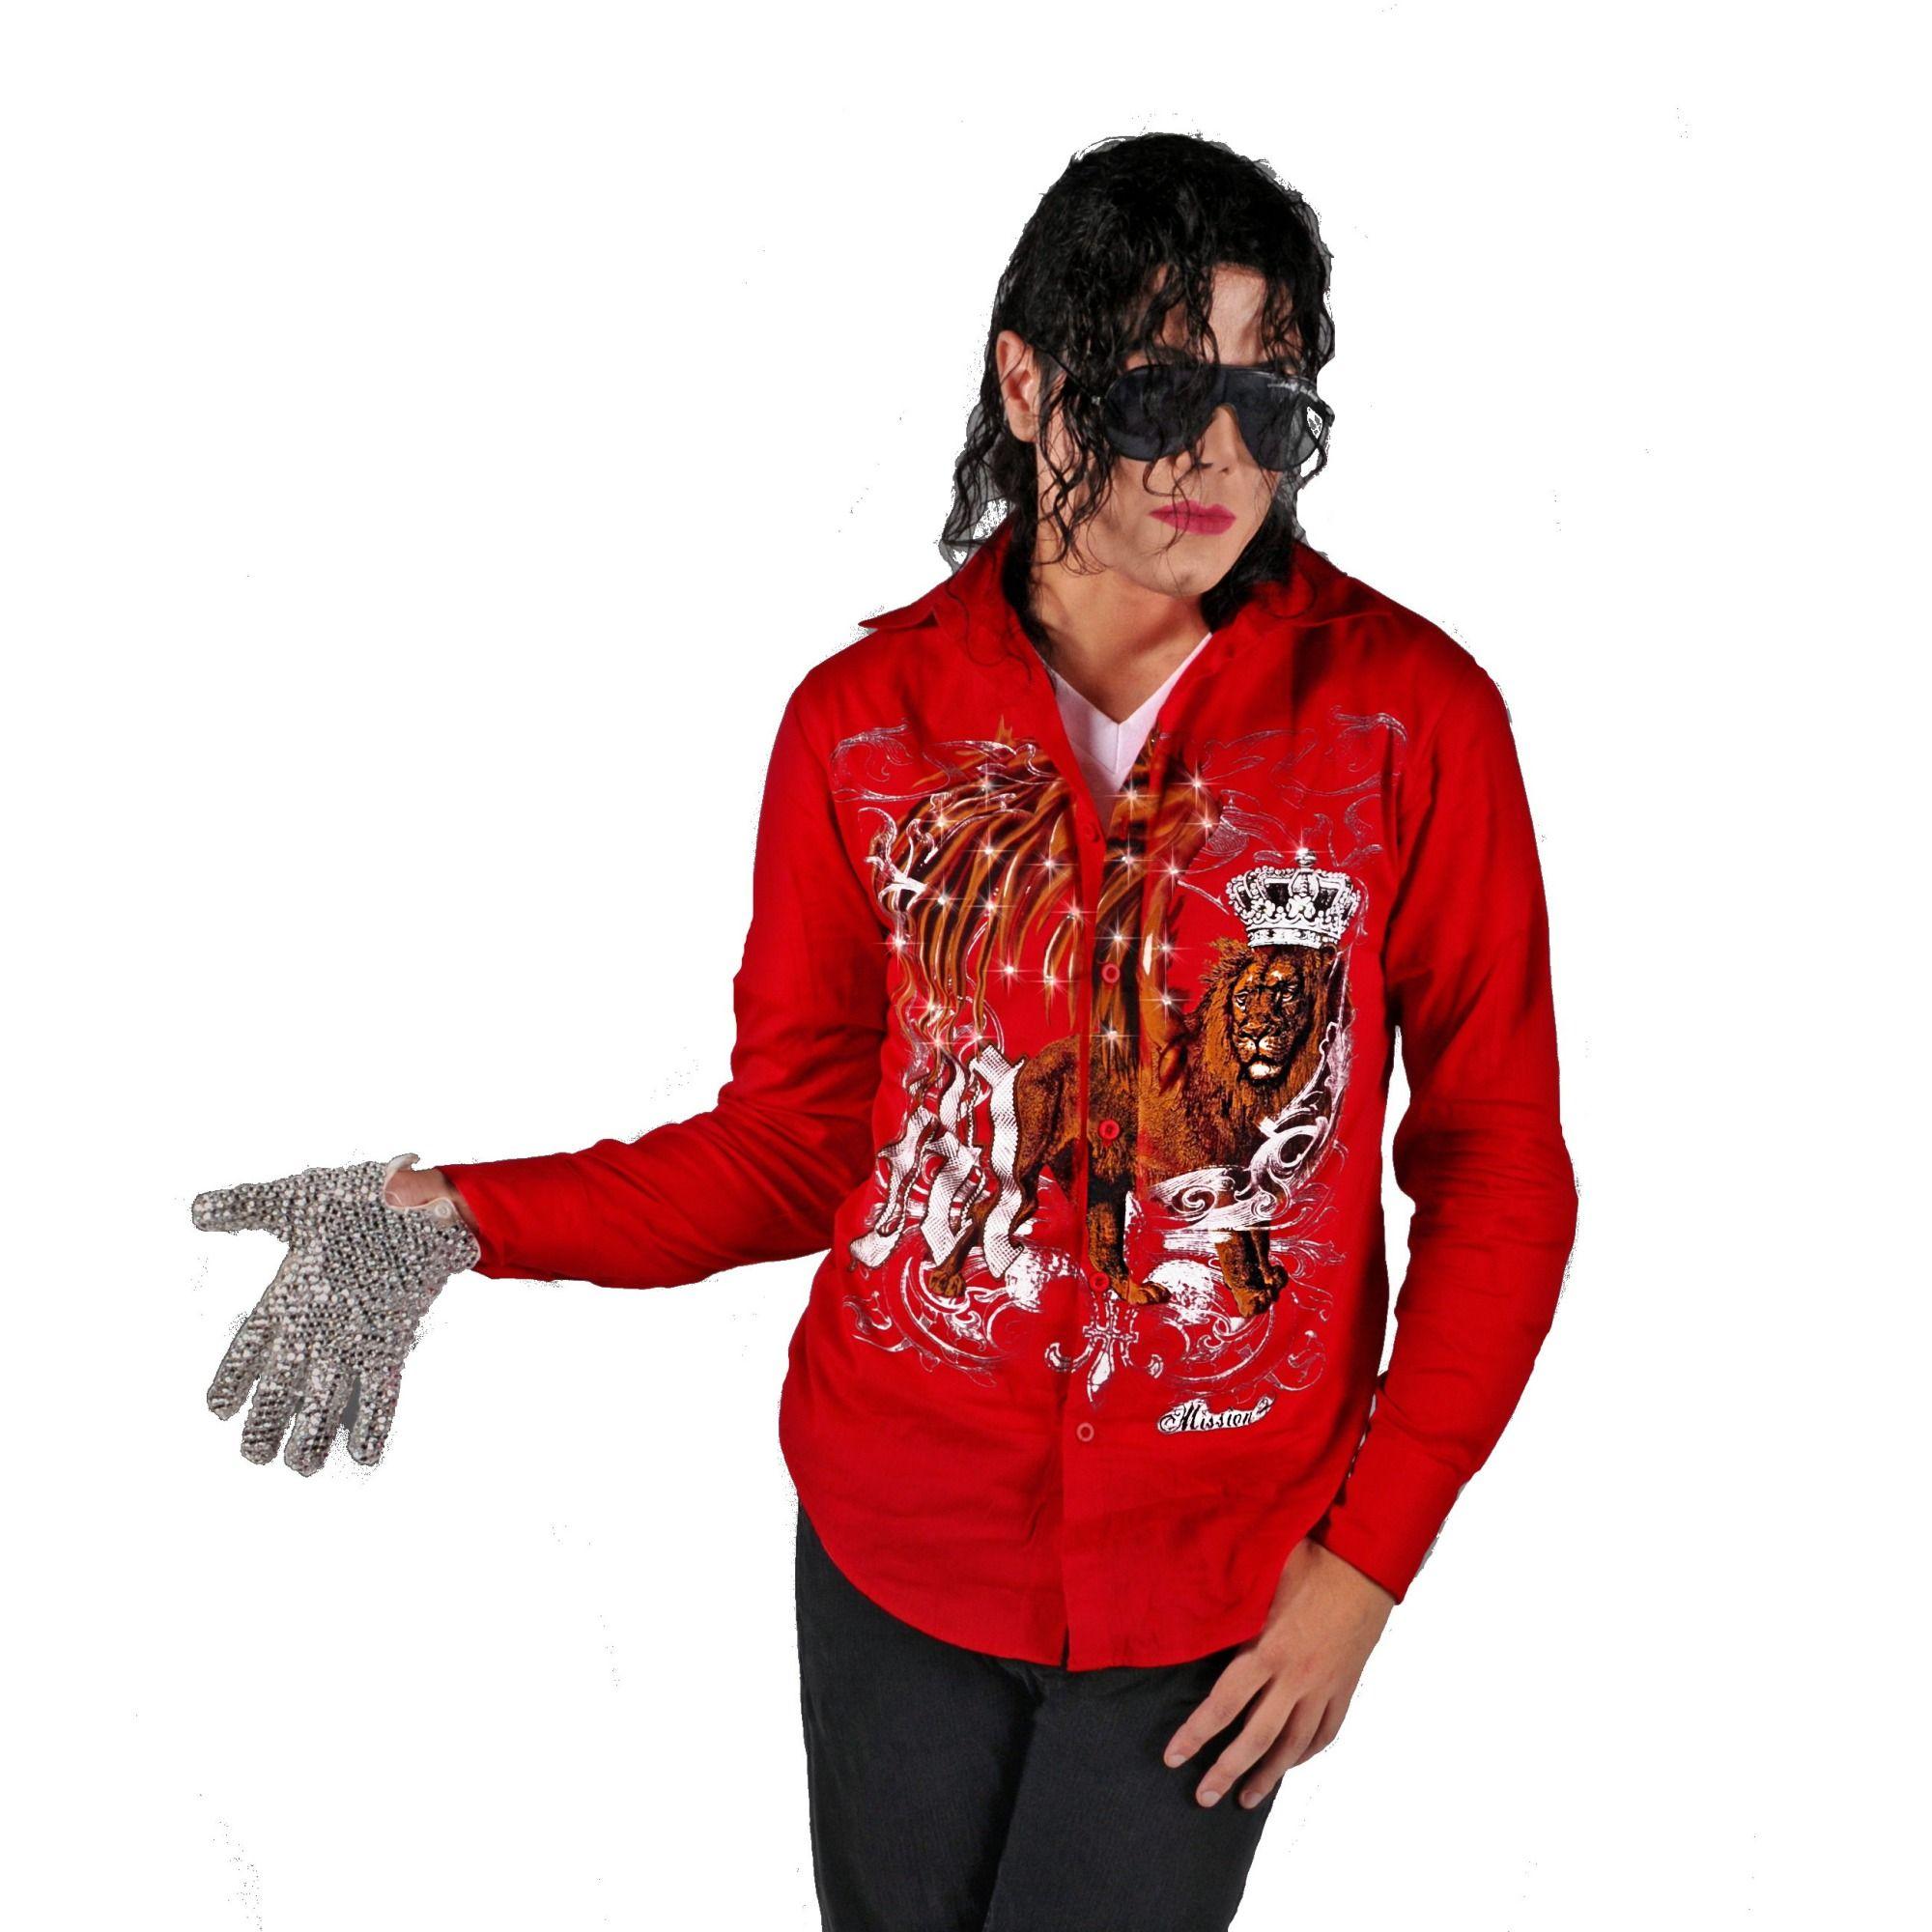 authentic mission clothing shirt michael jackson